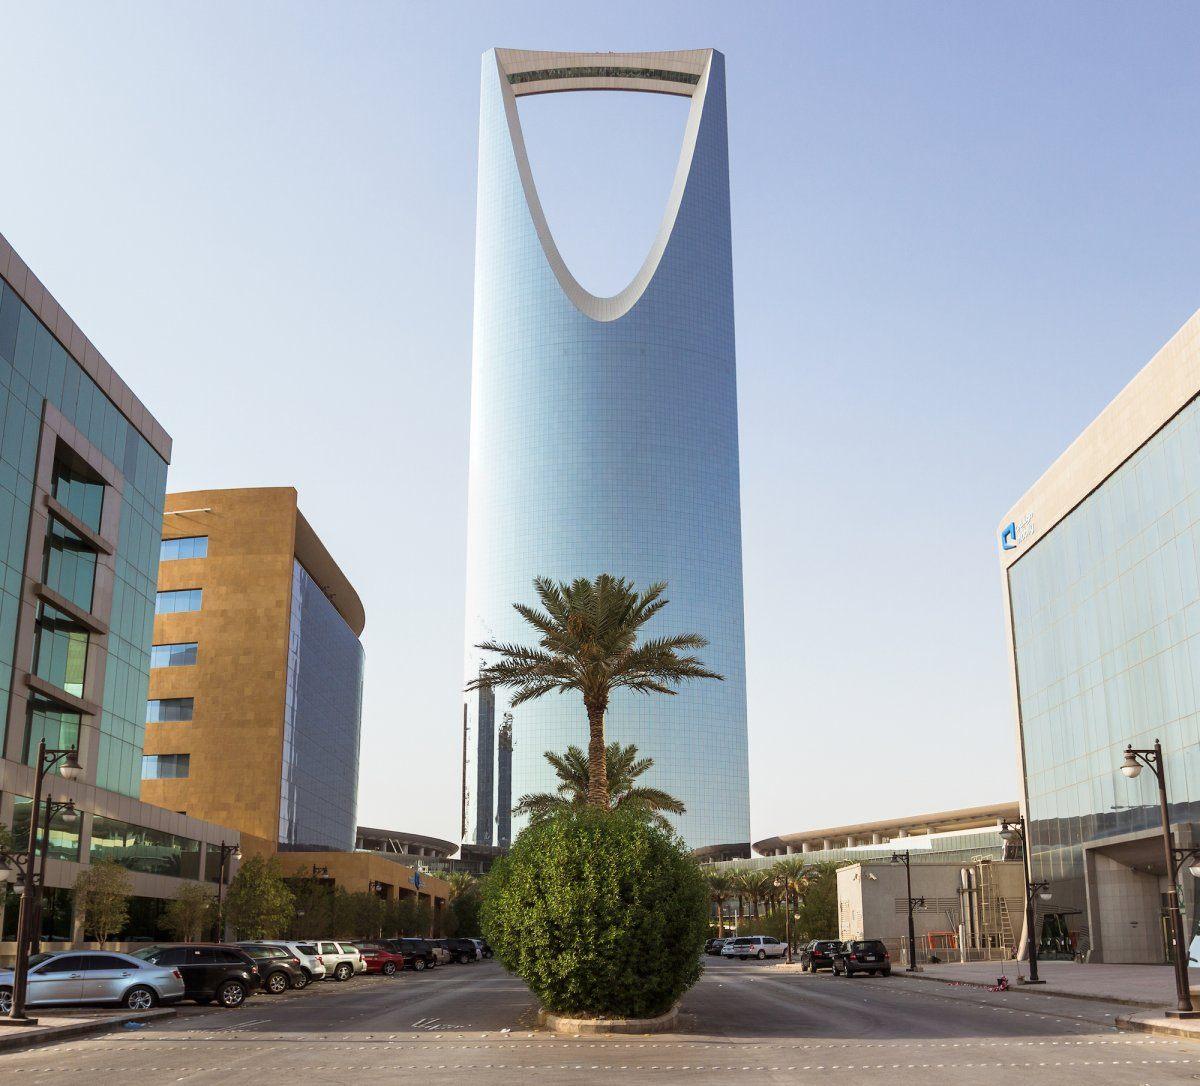 Skyscraper in Saudi Arabia